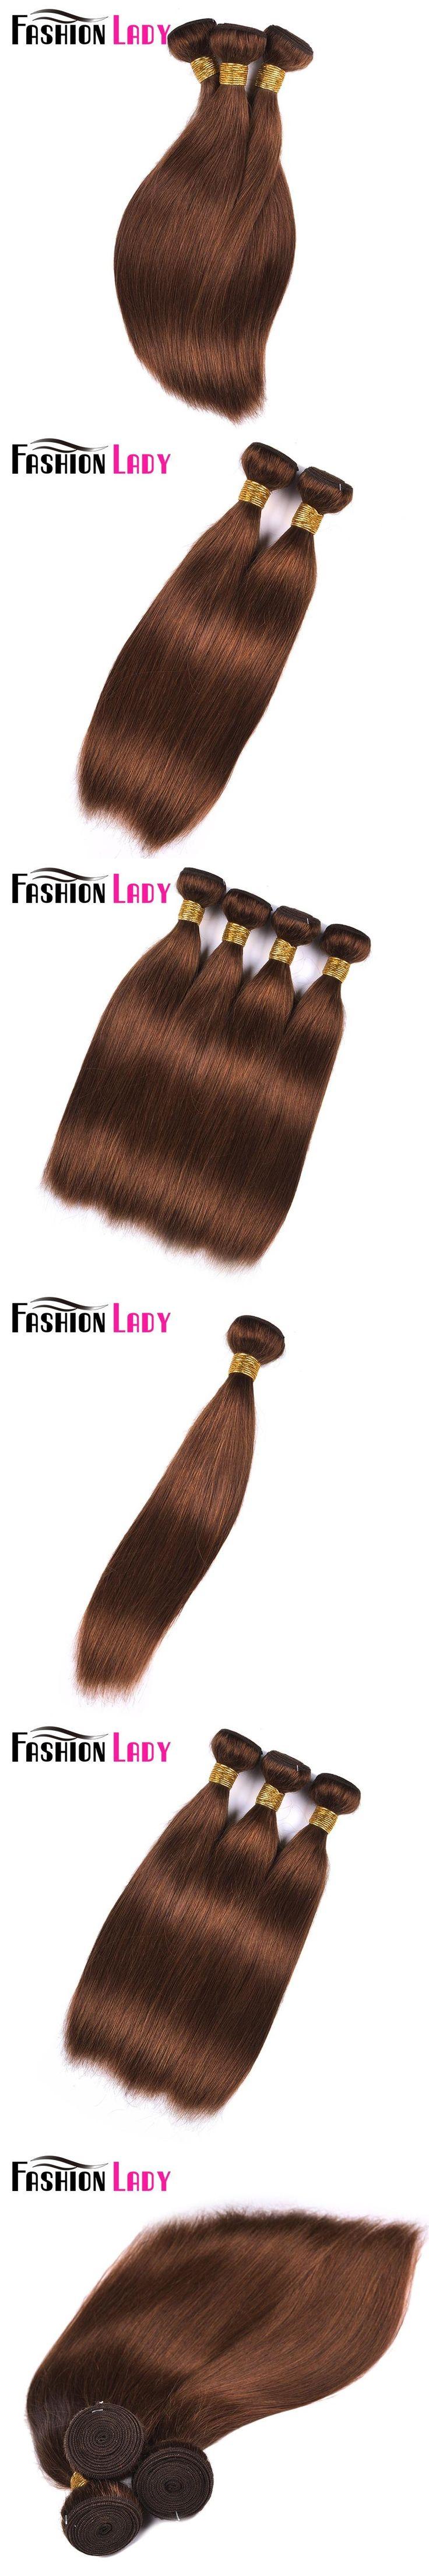 FASHION LADY Pre-Colored 100% Human Hair Weave #4 Medium Brown One Piece Peruvian Straight Hair Human Hair Weft Non-Remy